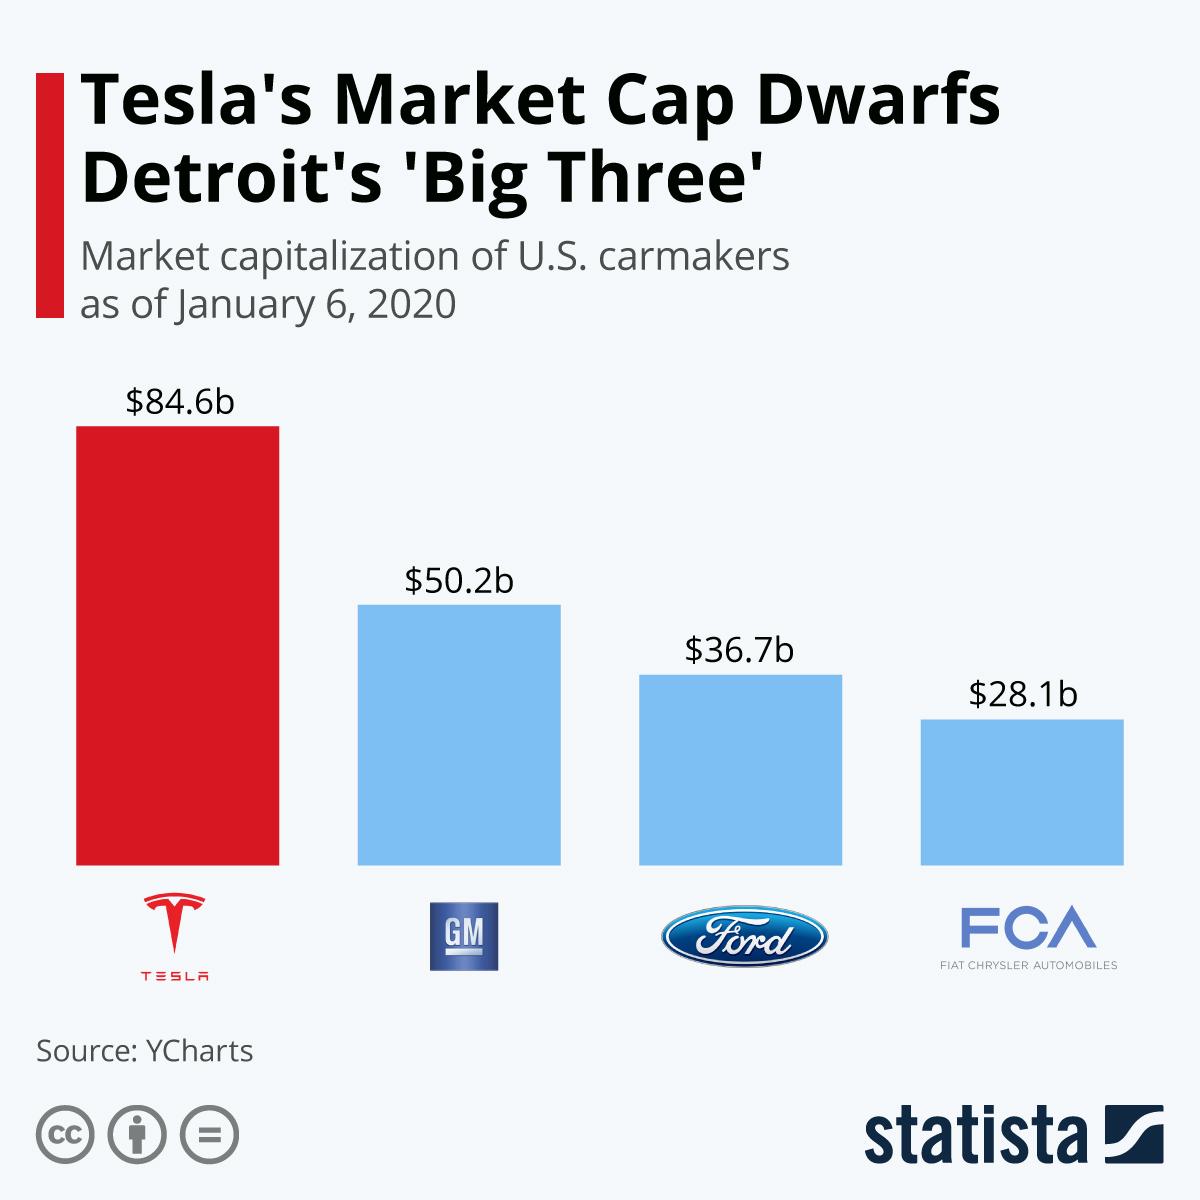 Infographic: Tesla's Market Cap Dwarfs Detroit's 'Big Three' | Statista